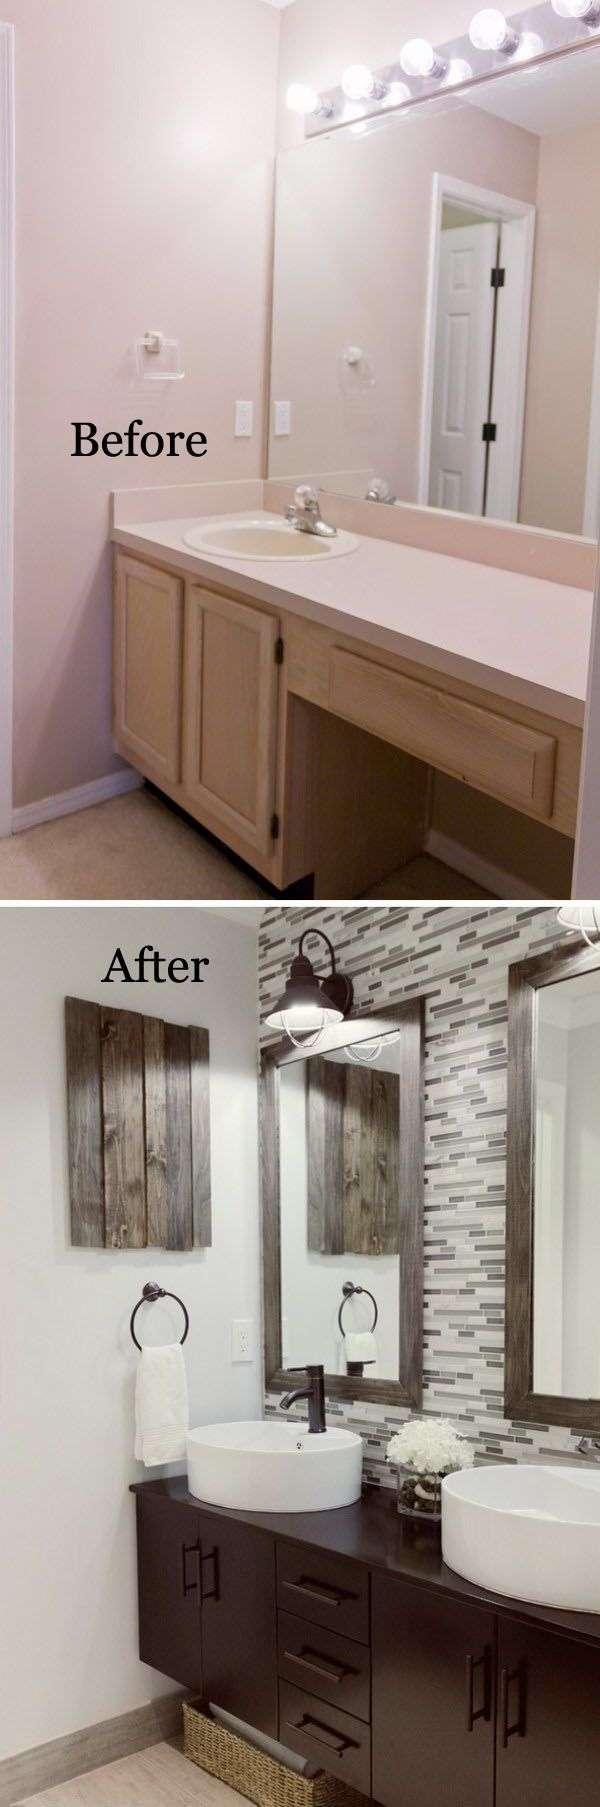 Best Budget Friendly Bathroom Makeover Ideas